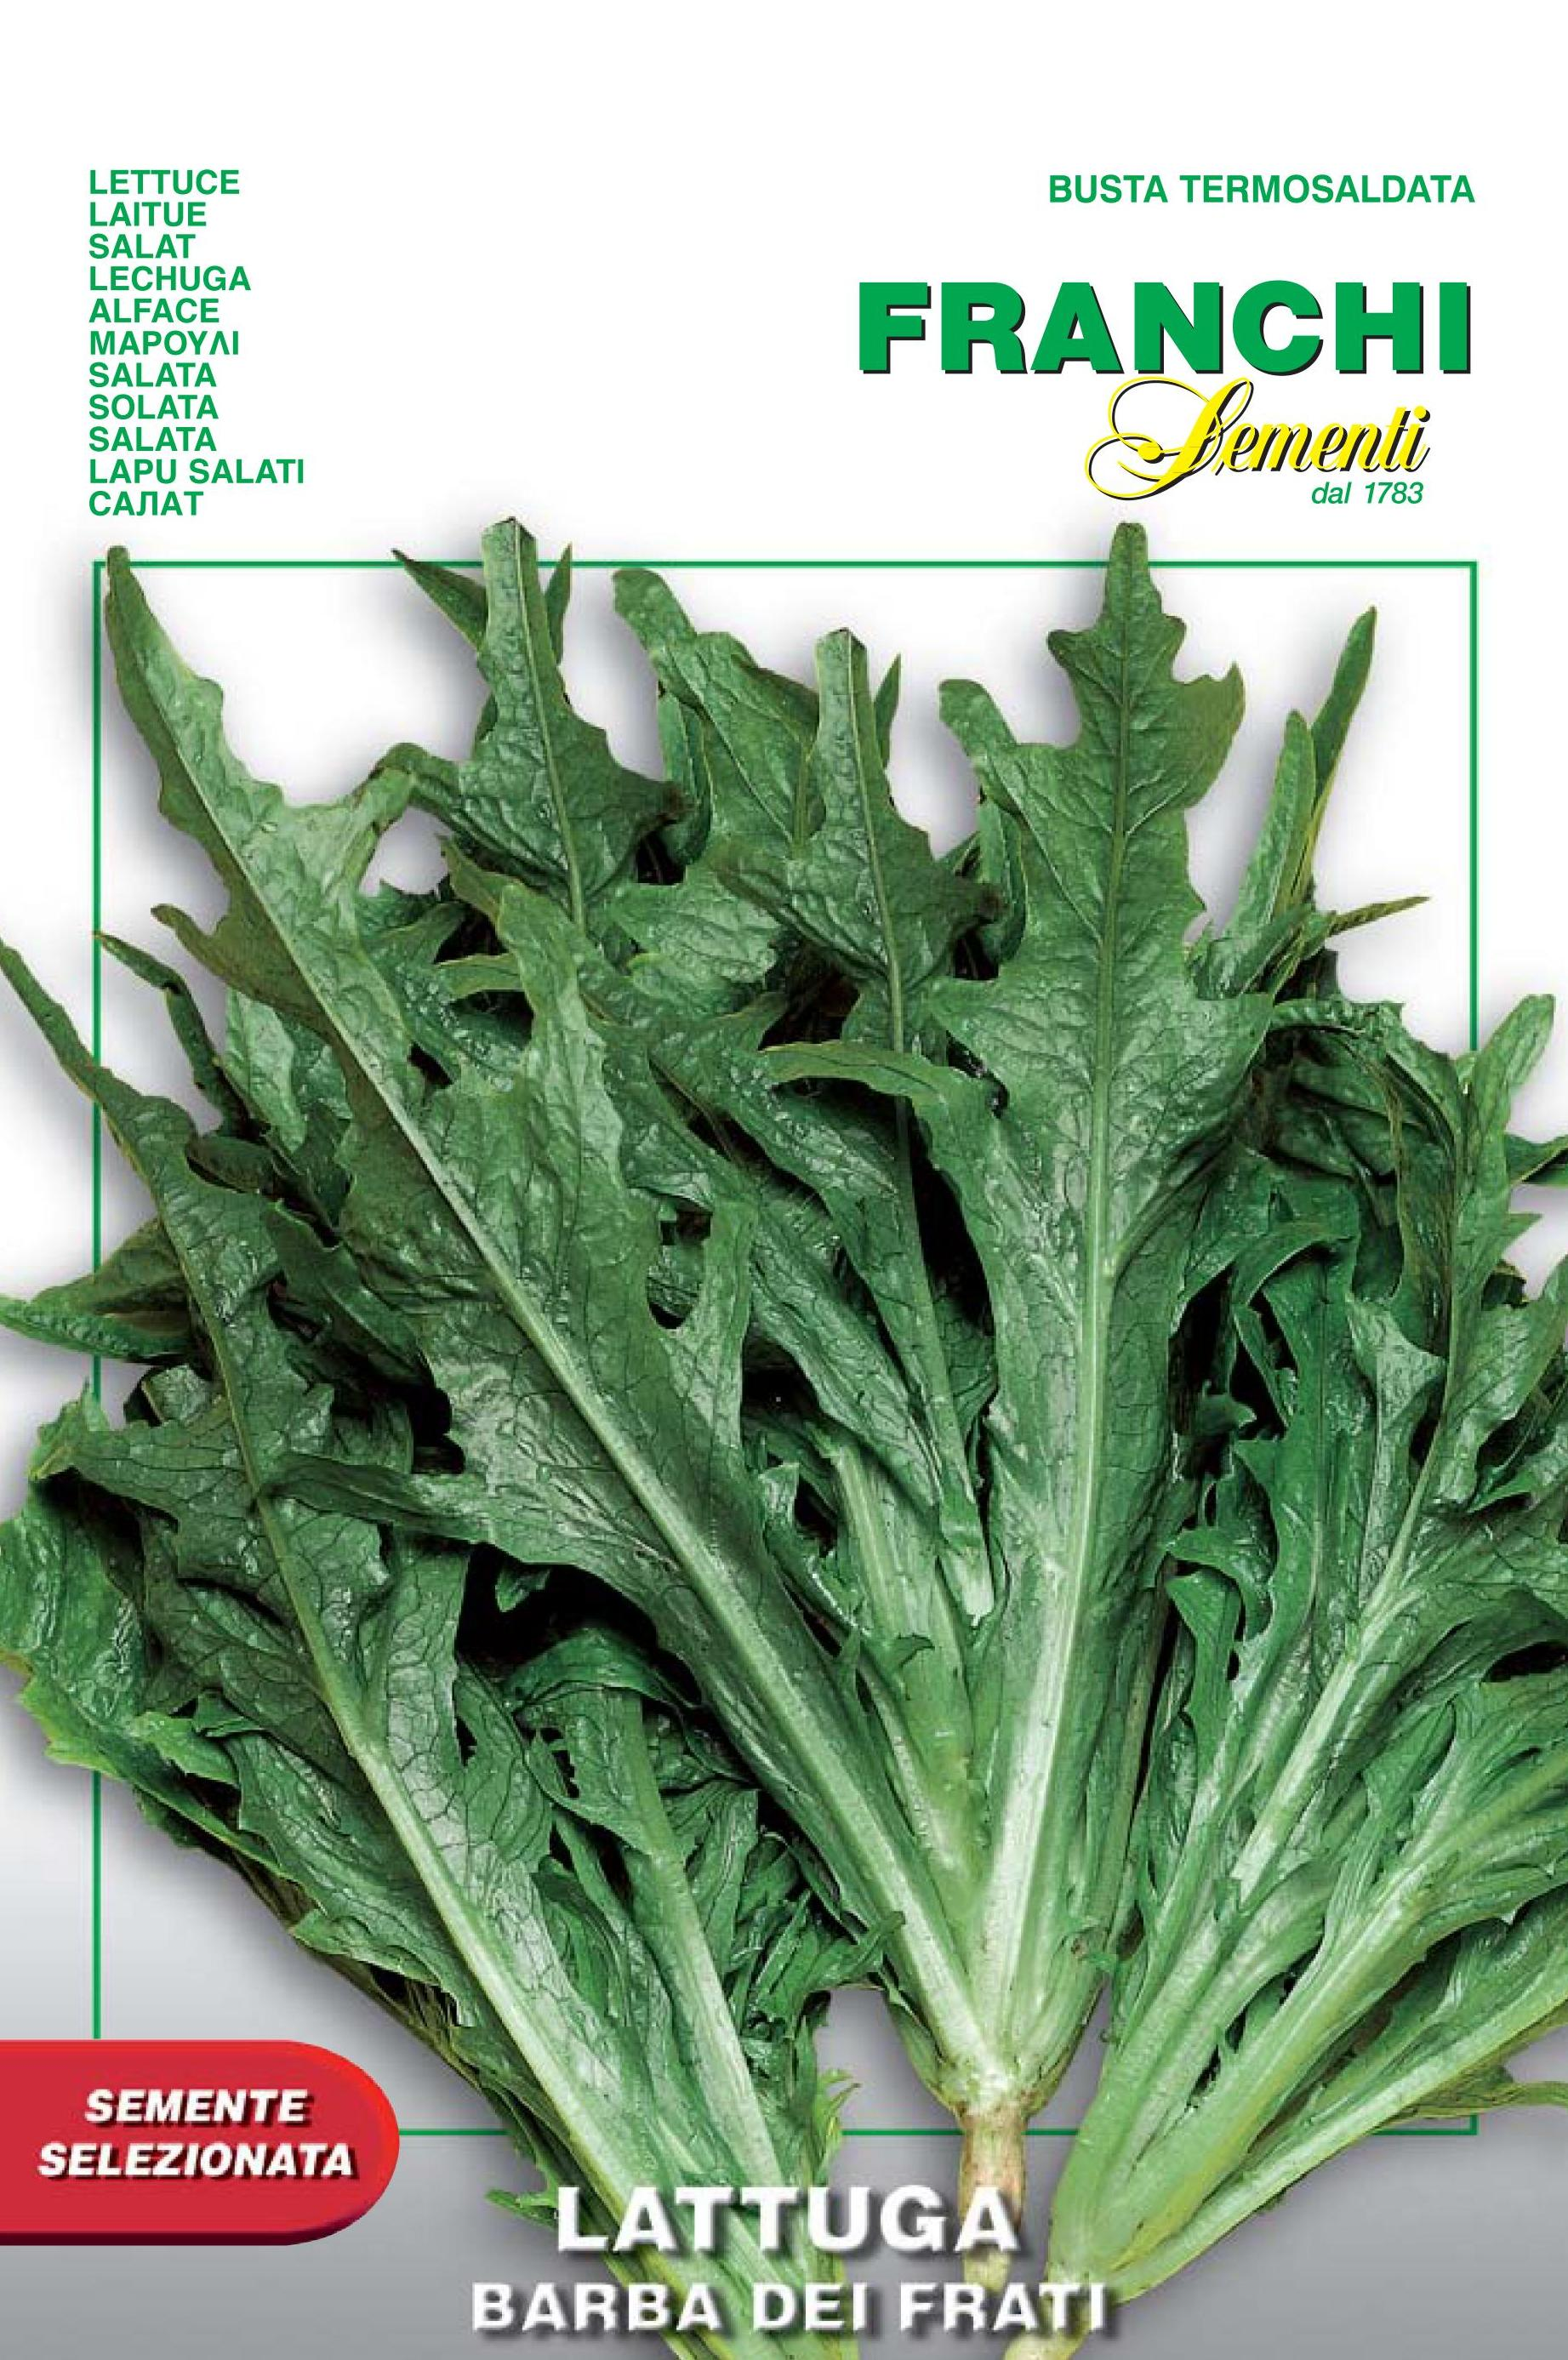 Lettuce Radichetta/Barba Di Frate